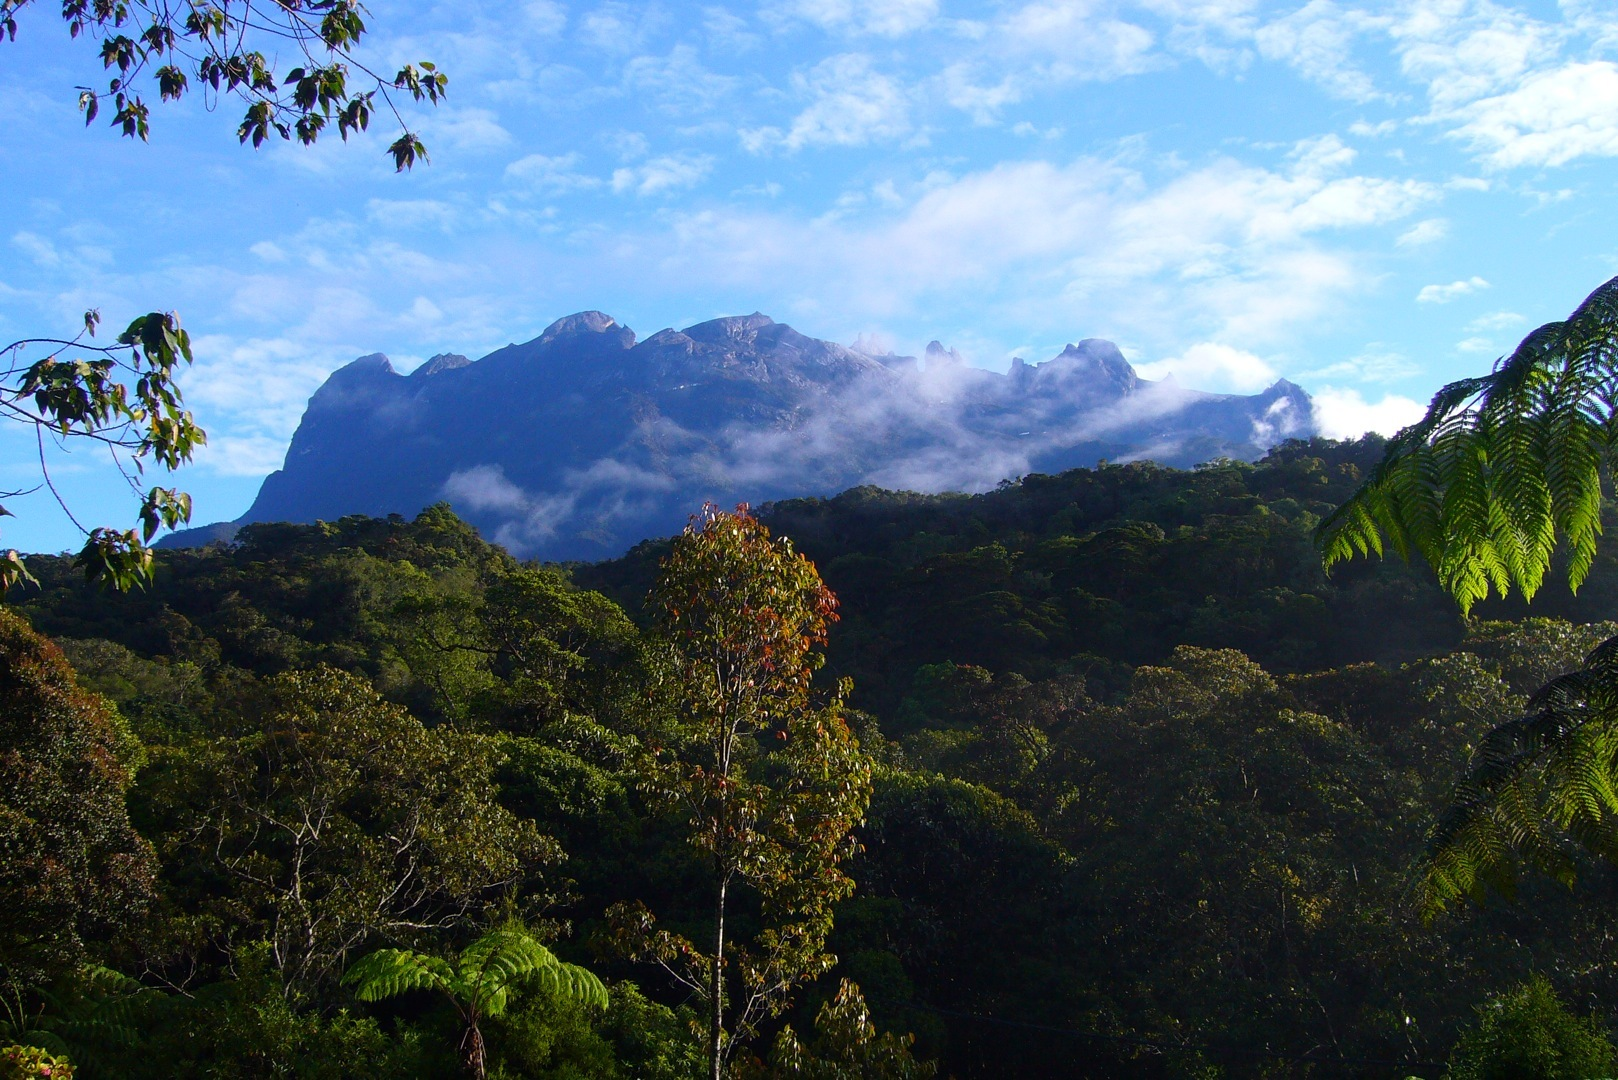 Mount-Kinabalu-Pictures-1-2